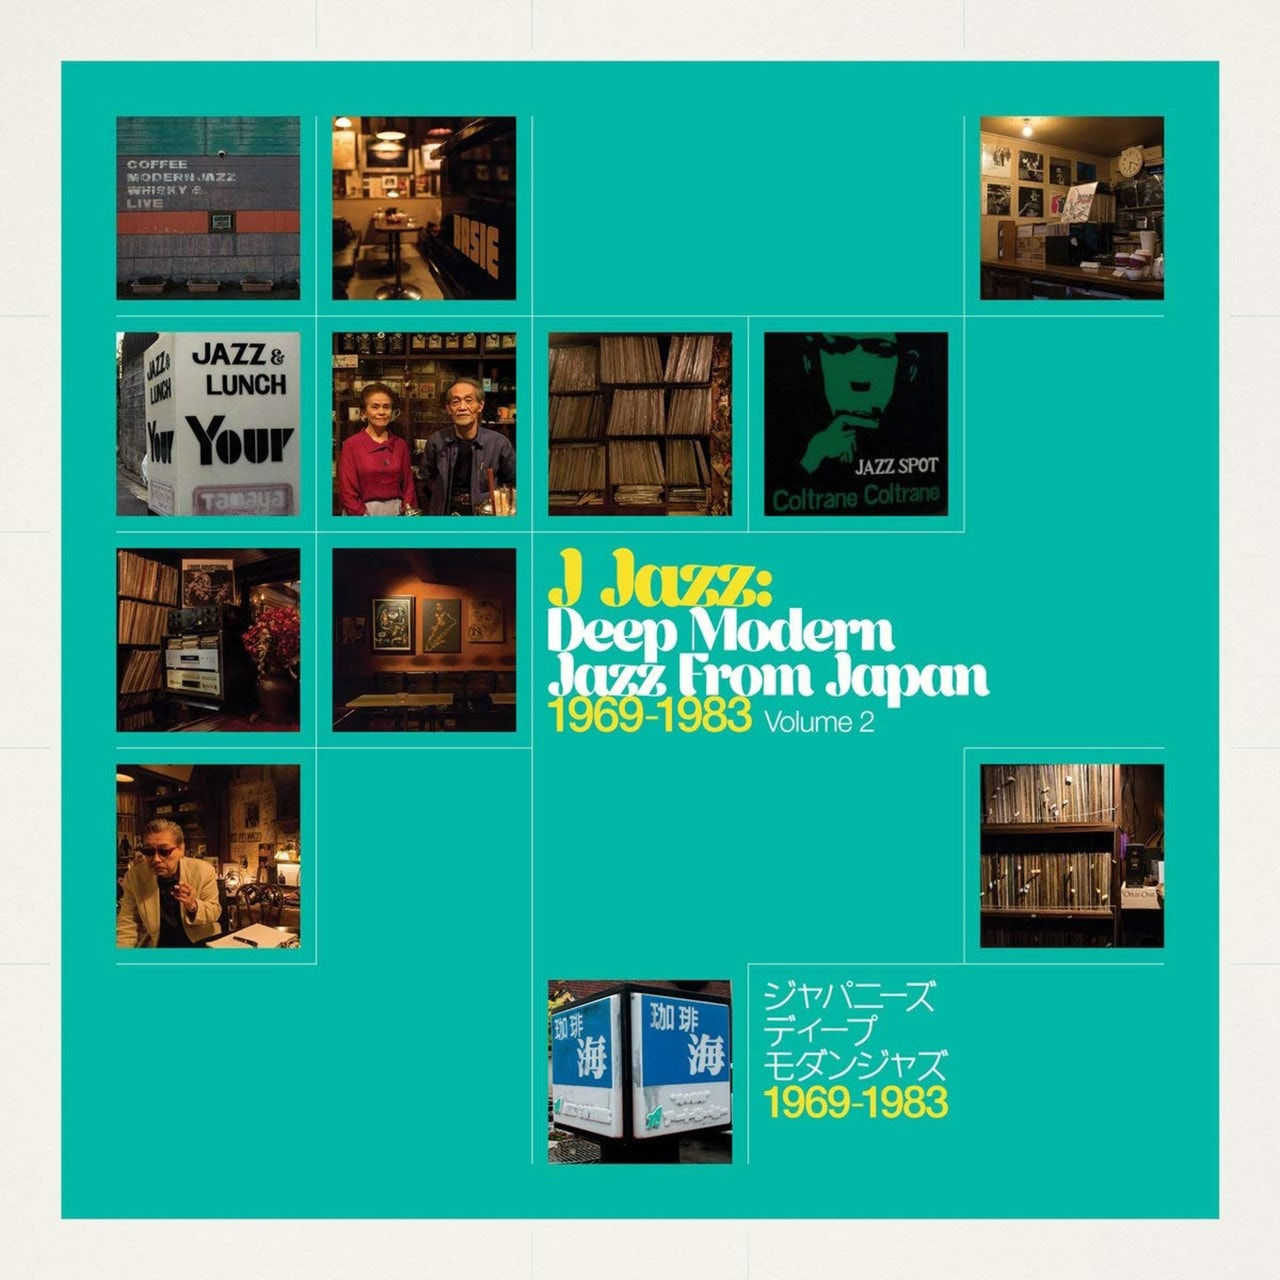 J Jazz: Deep Modern Jazz from Japan 1969-1983 - Volume 2 - 1